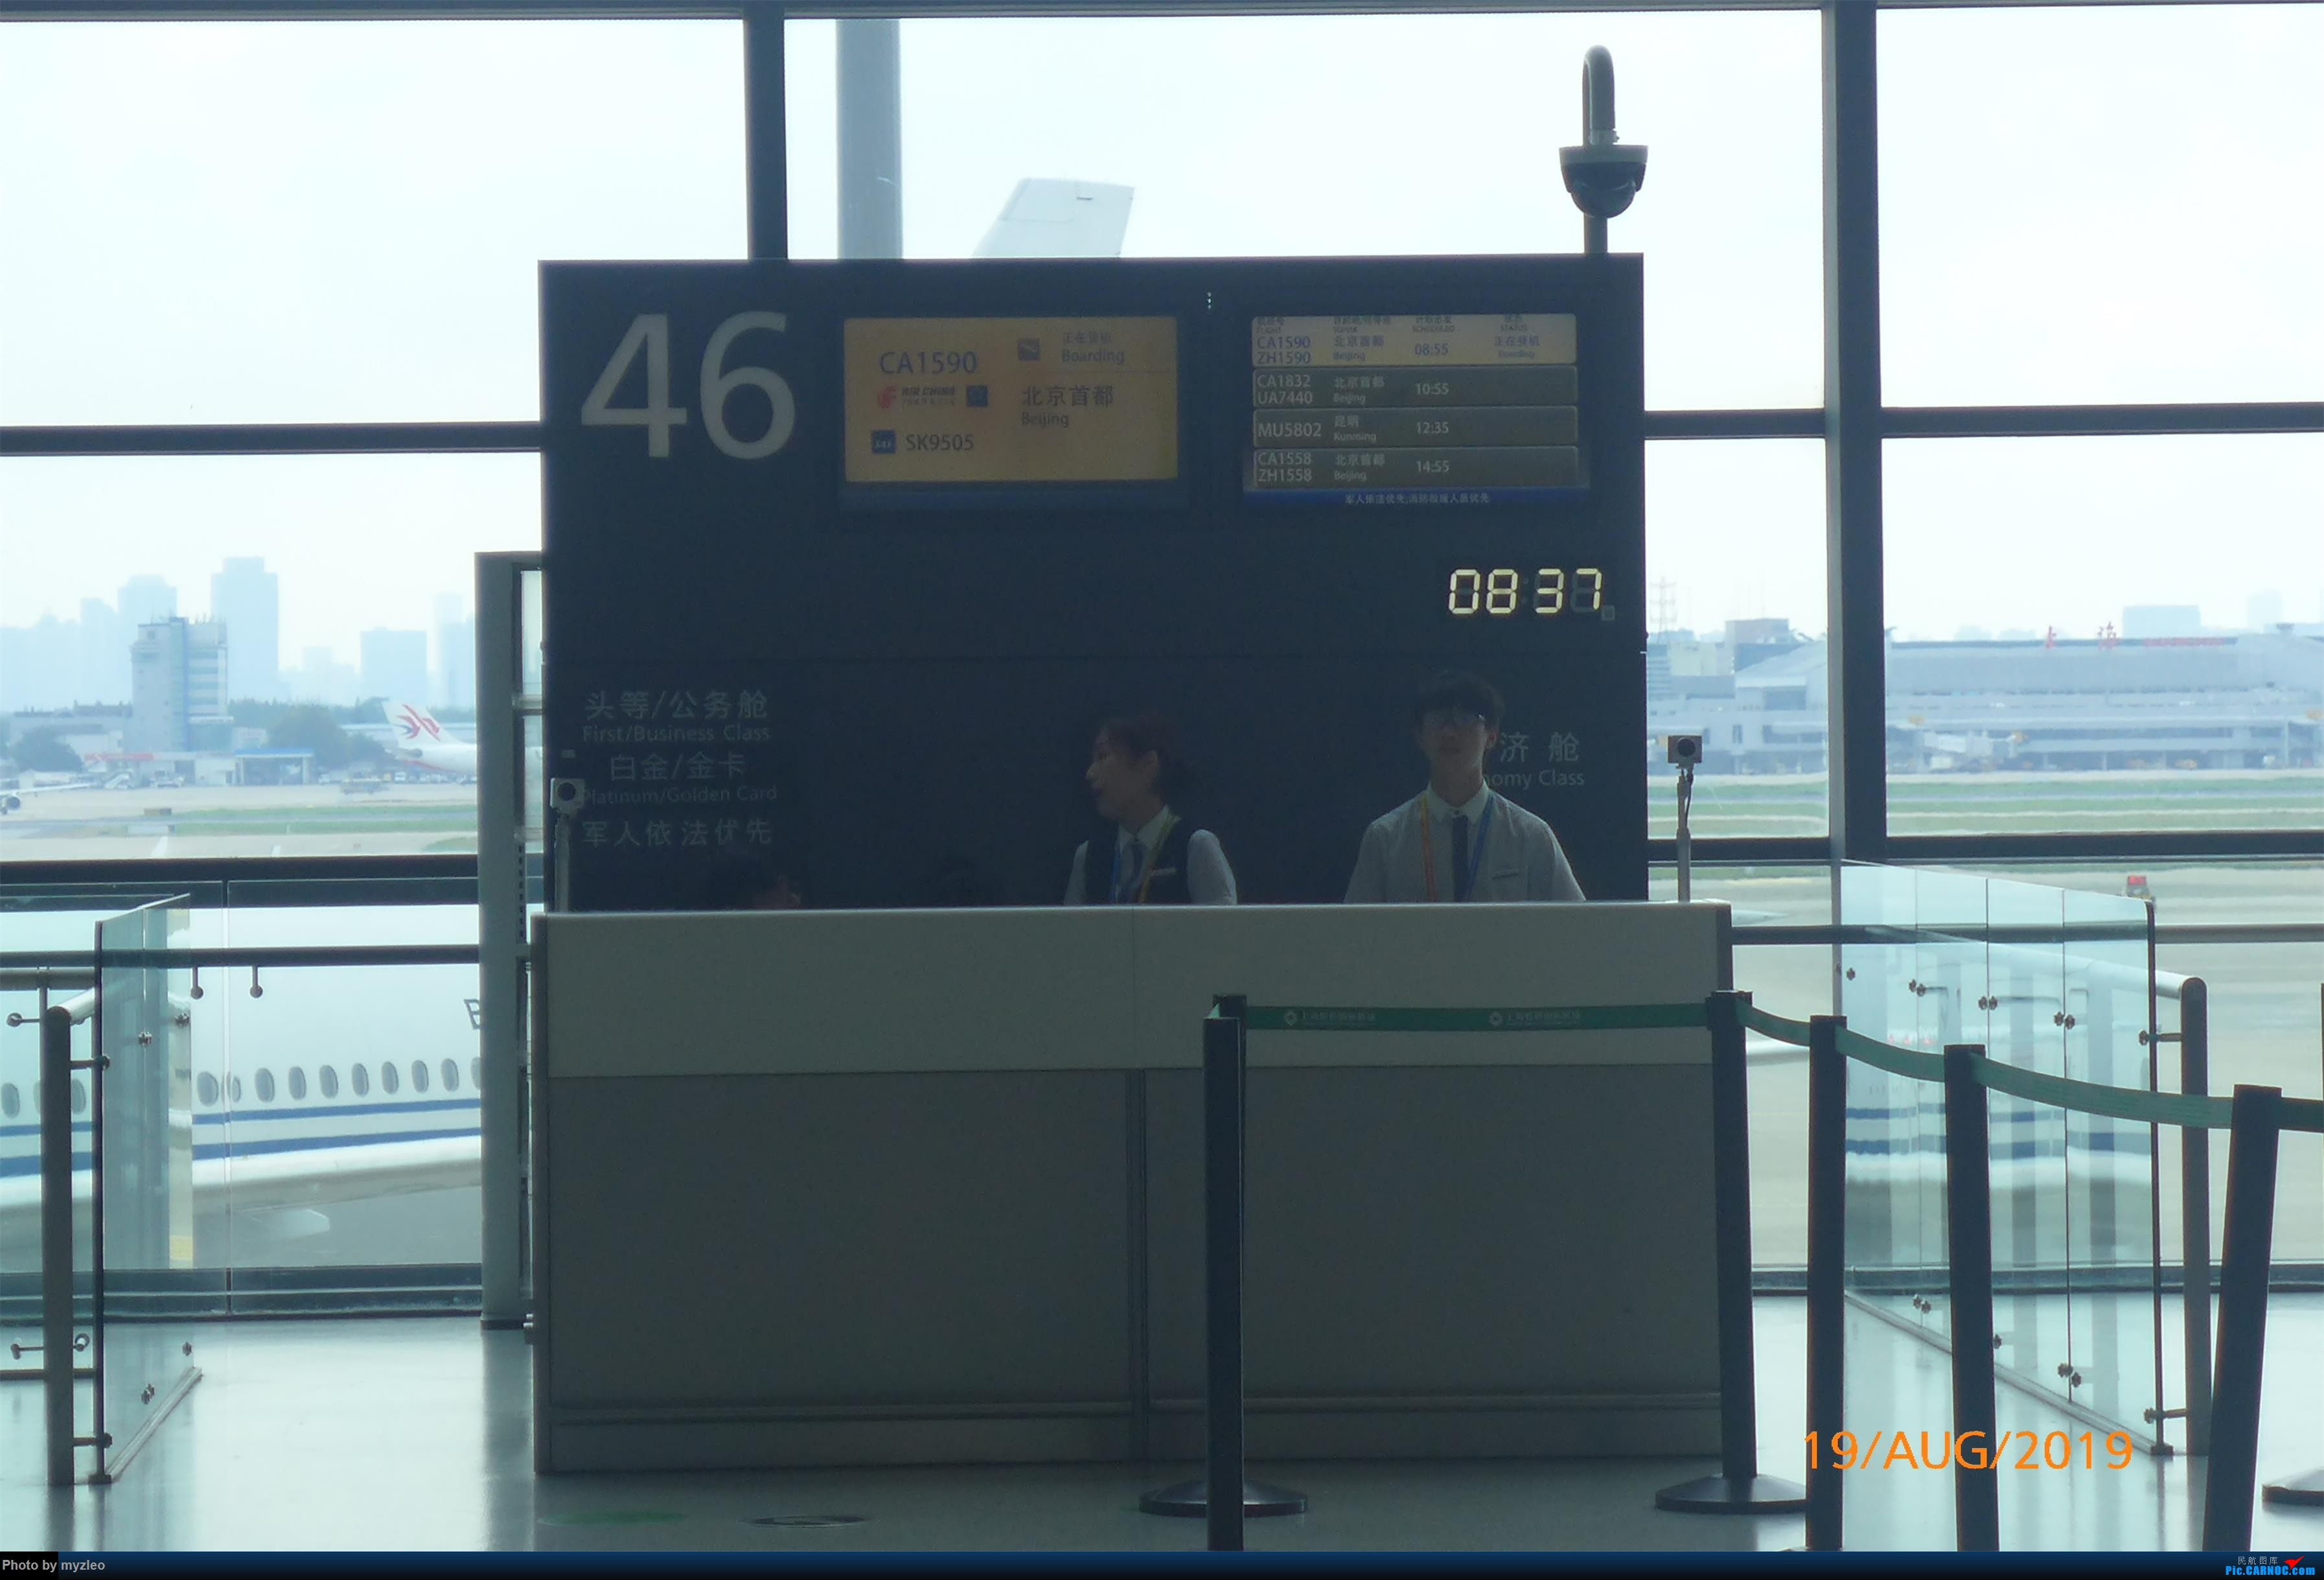 Re:[原创]【myzleo的游记5.1】梦圆一九(1)首搭国航359,北京城里到处走    中国上海虹桥国际机场